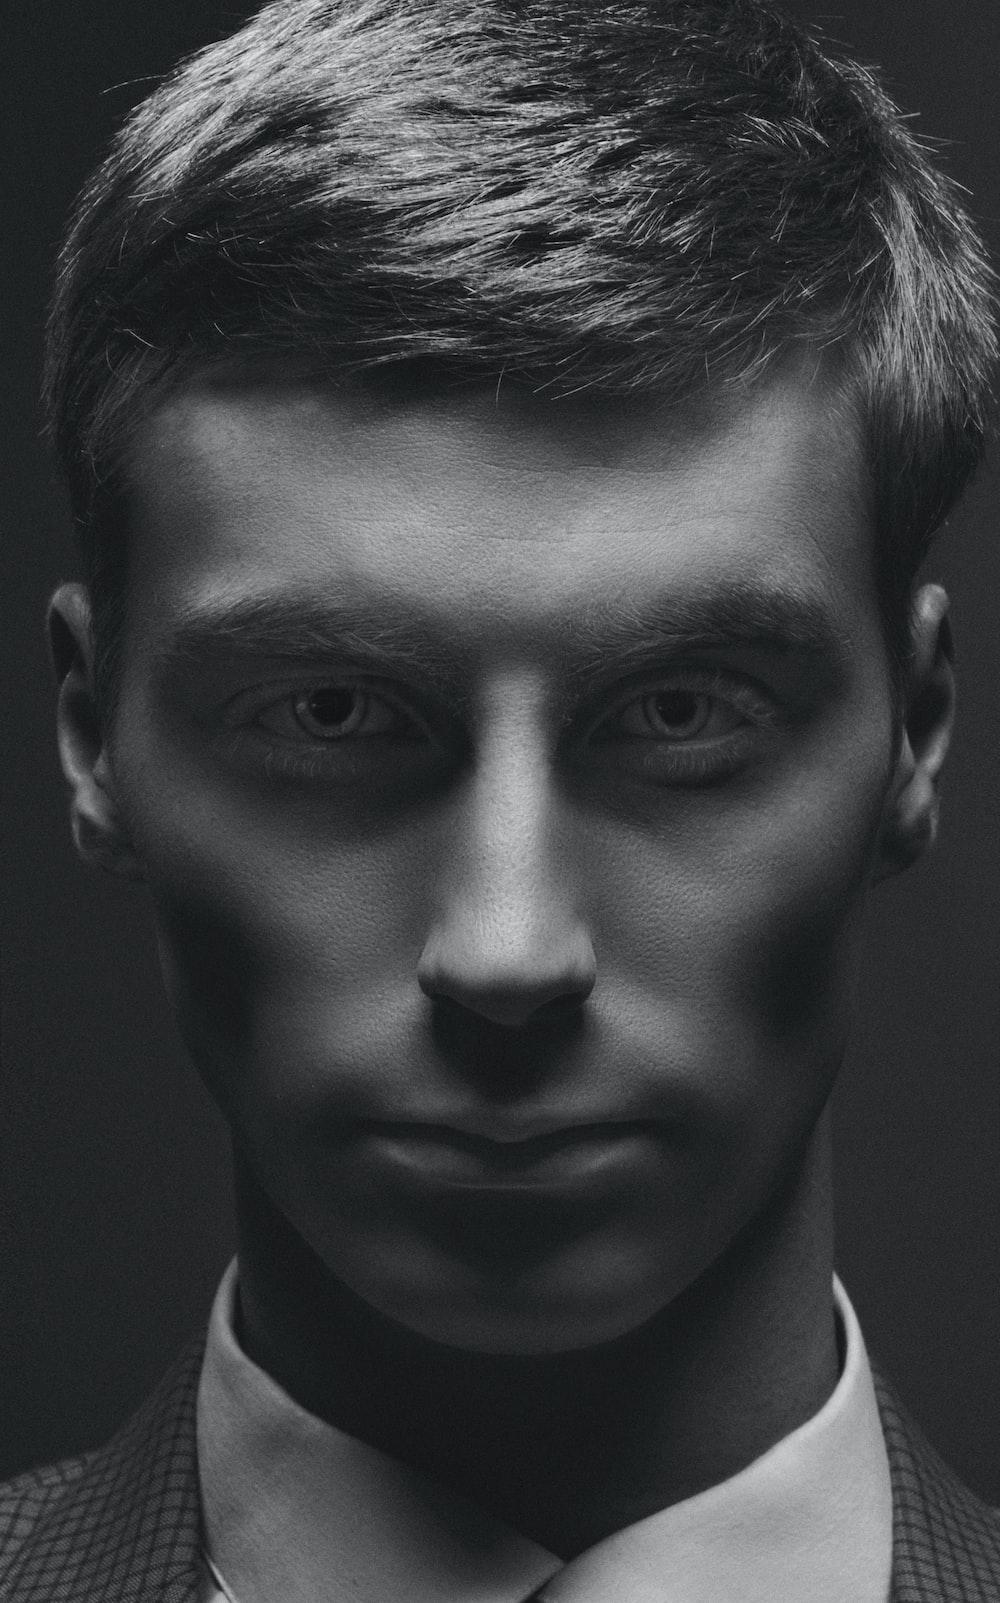 monochrome photo of man's face